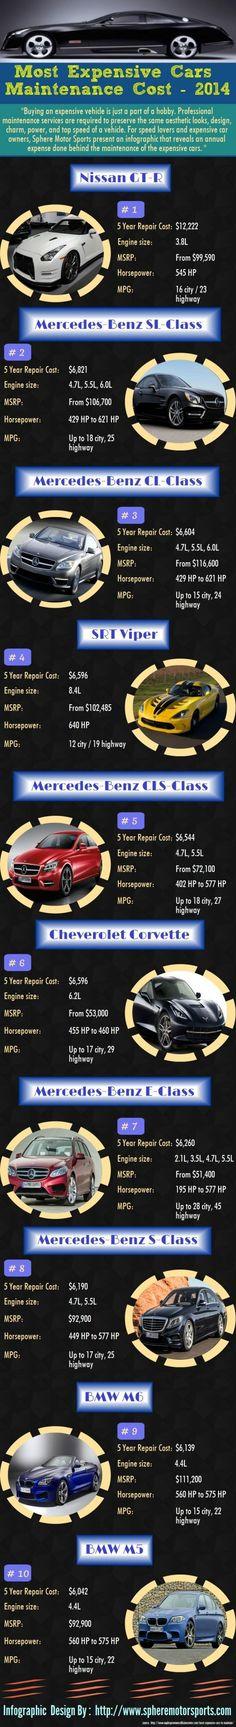 727 Best Car Maintenance Images On Pinterest Autos Car Brake